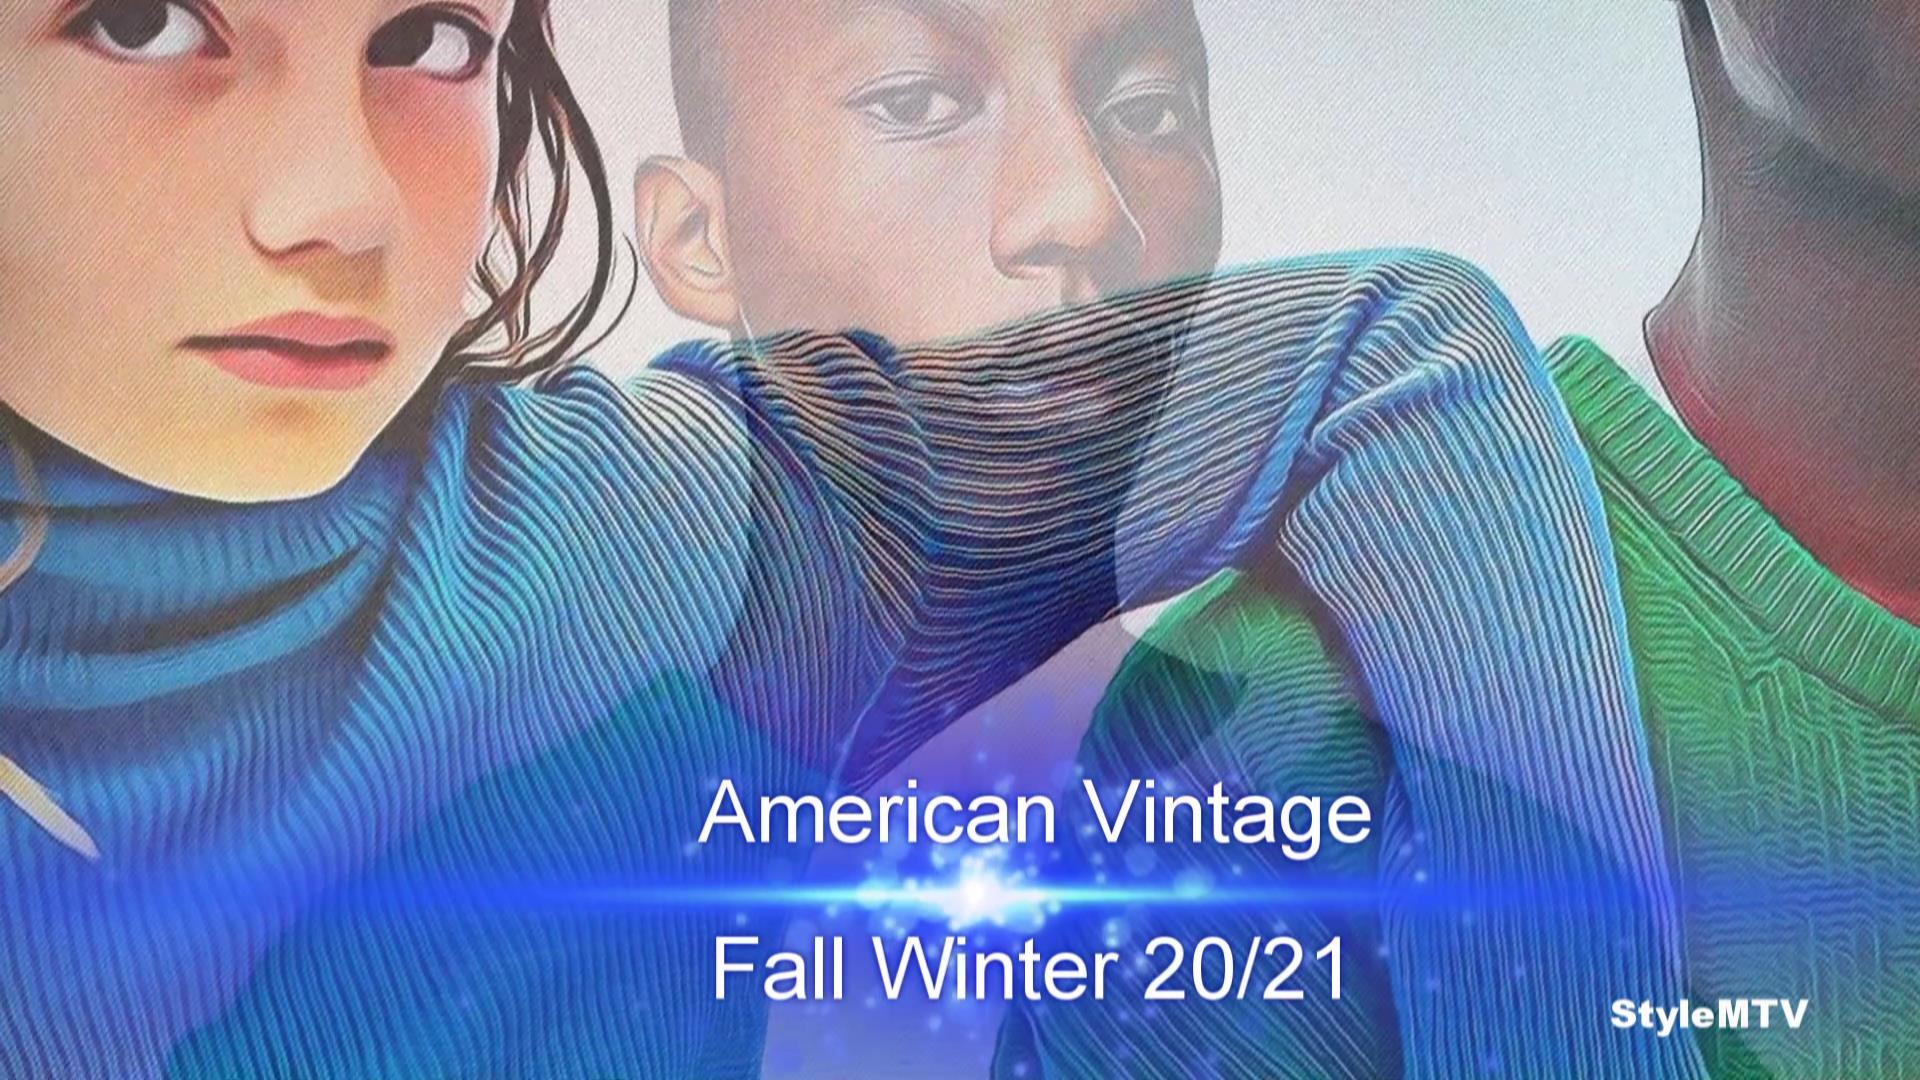 American Vintage Fall Winter 20-21 Art